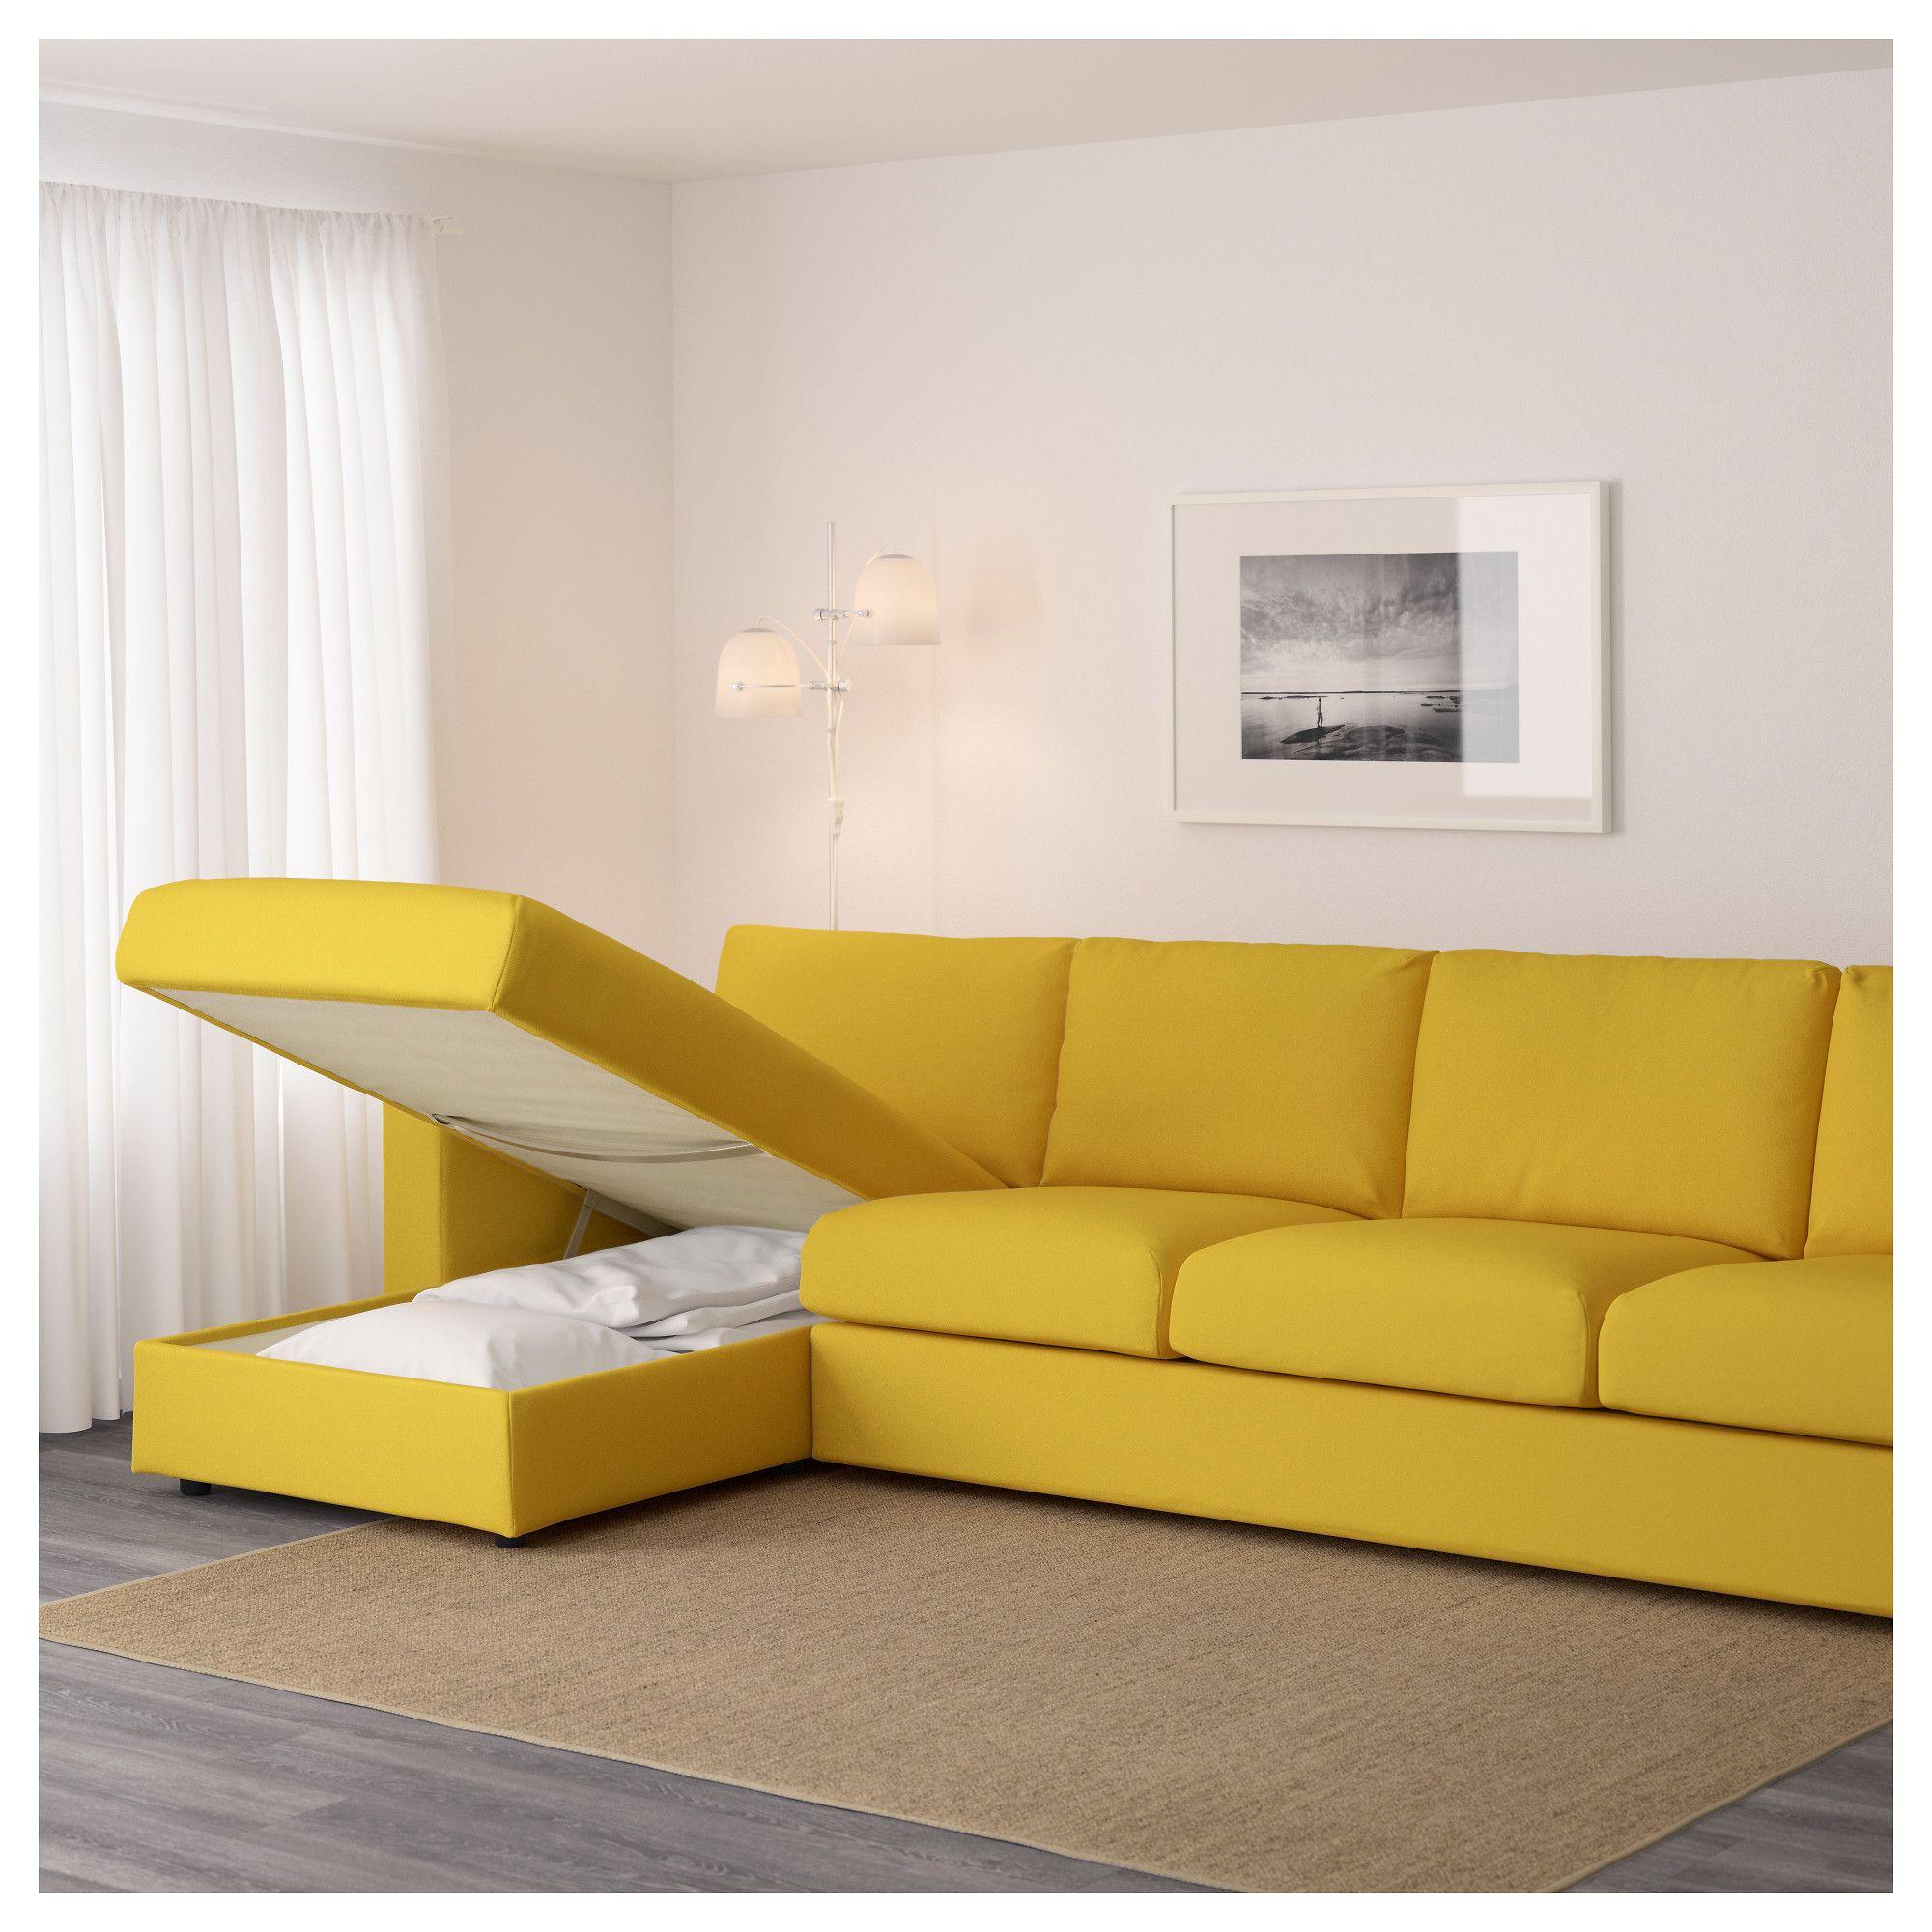 Vimle 4 Seat Sofa With Chaise Longue Gr Sbo Golden Yellow Cosy  # Muebles Bernardo Leon